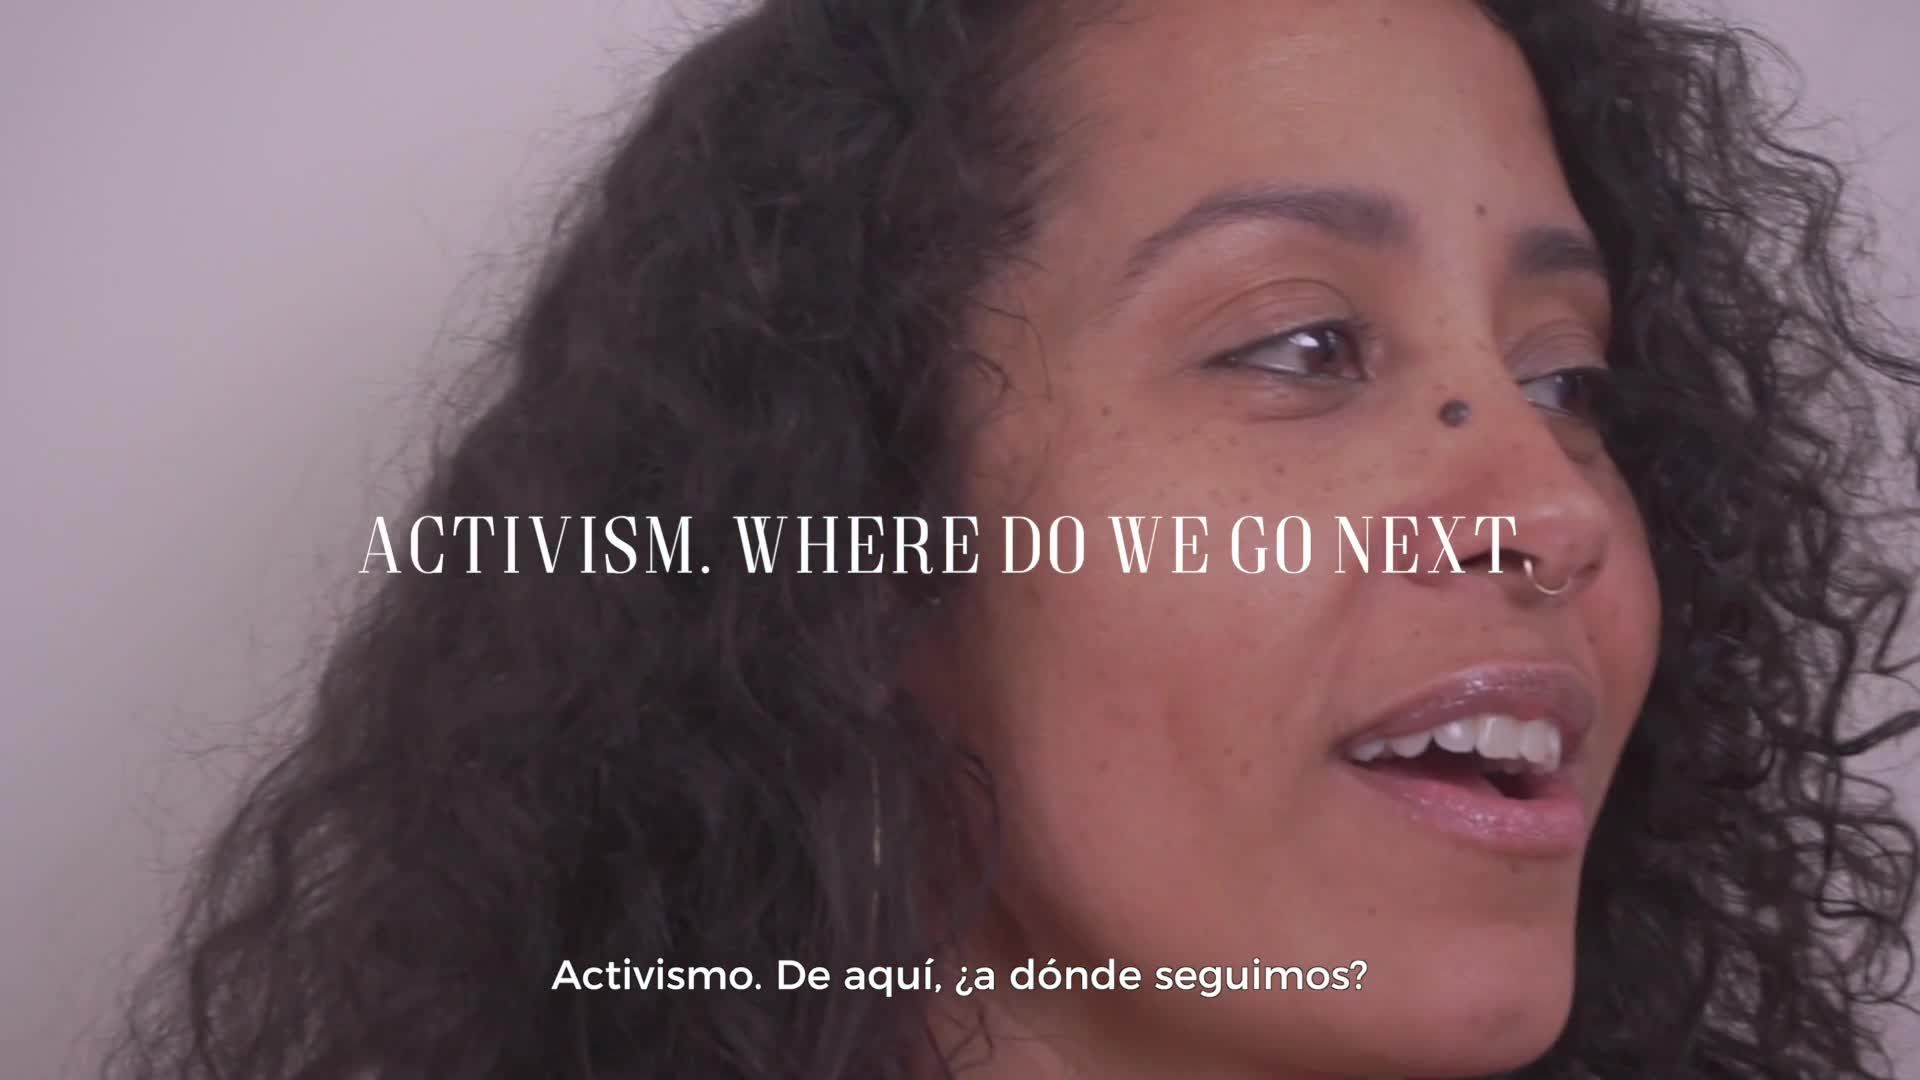 ¡REPRESENTA! | Episode 9 | Activism. Where do we go next?